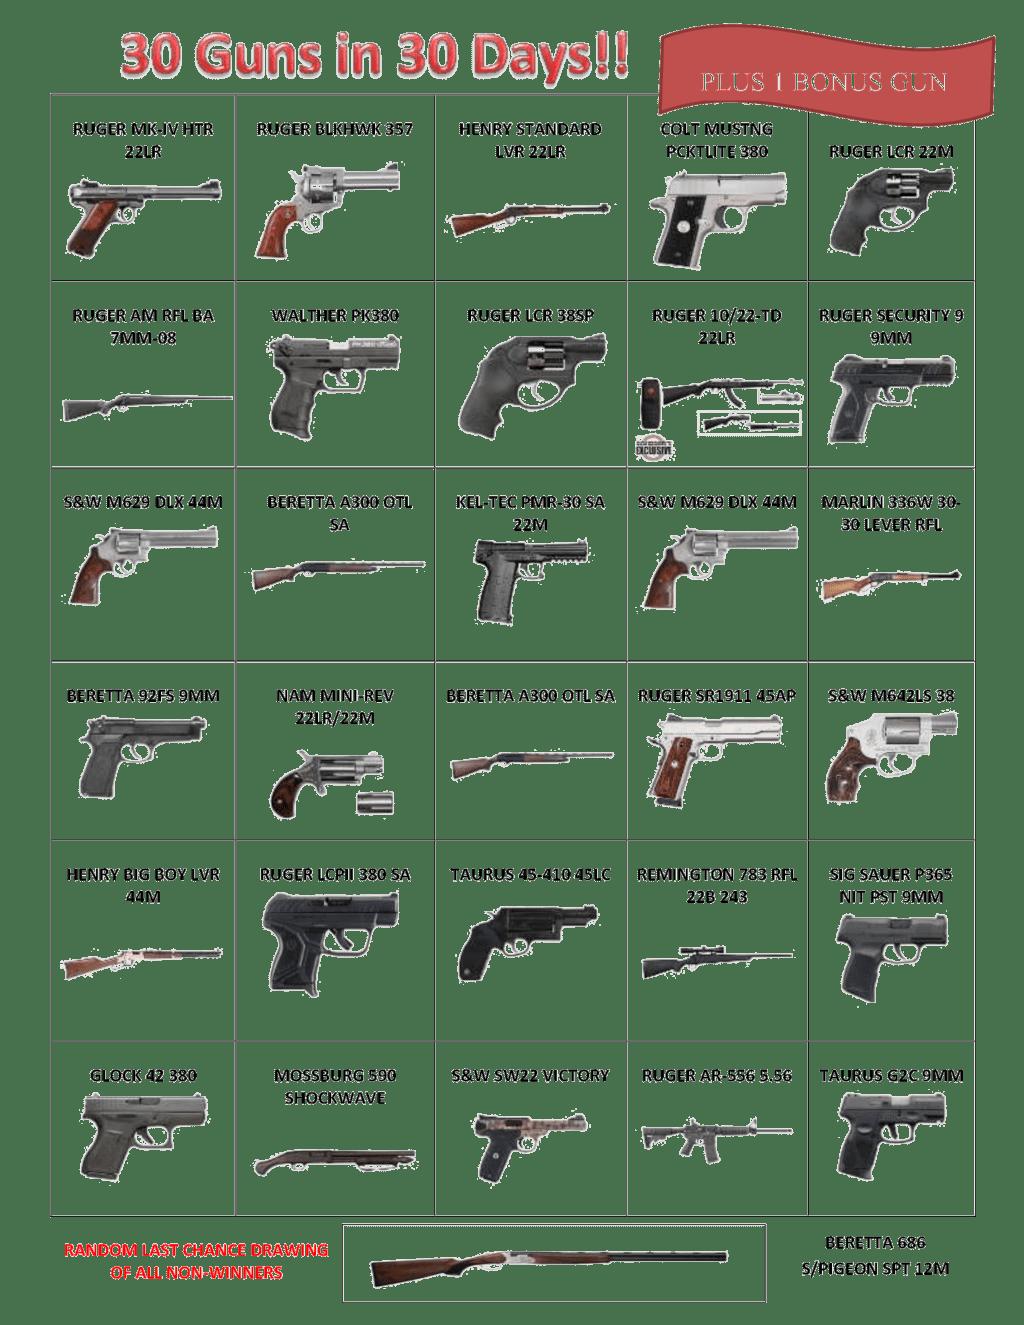 30 Guns in 30 Days